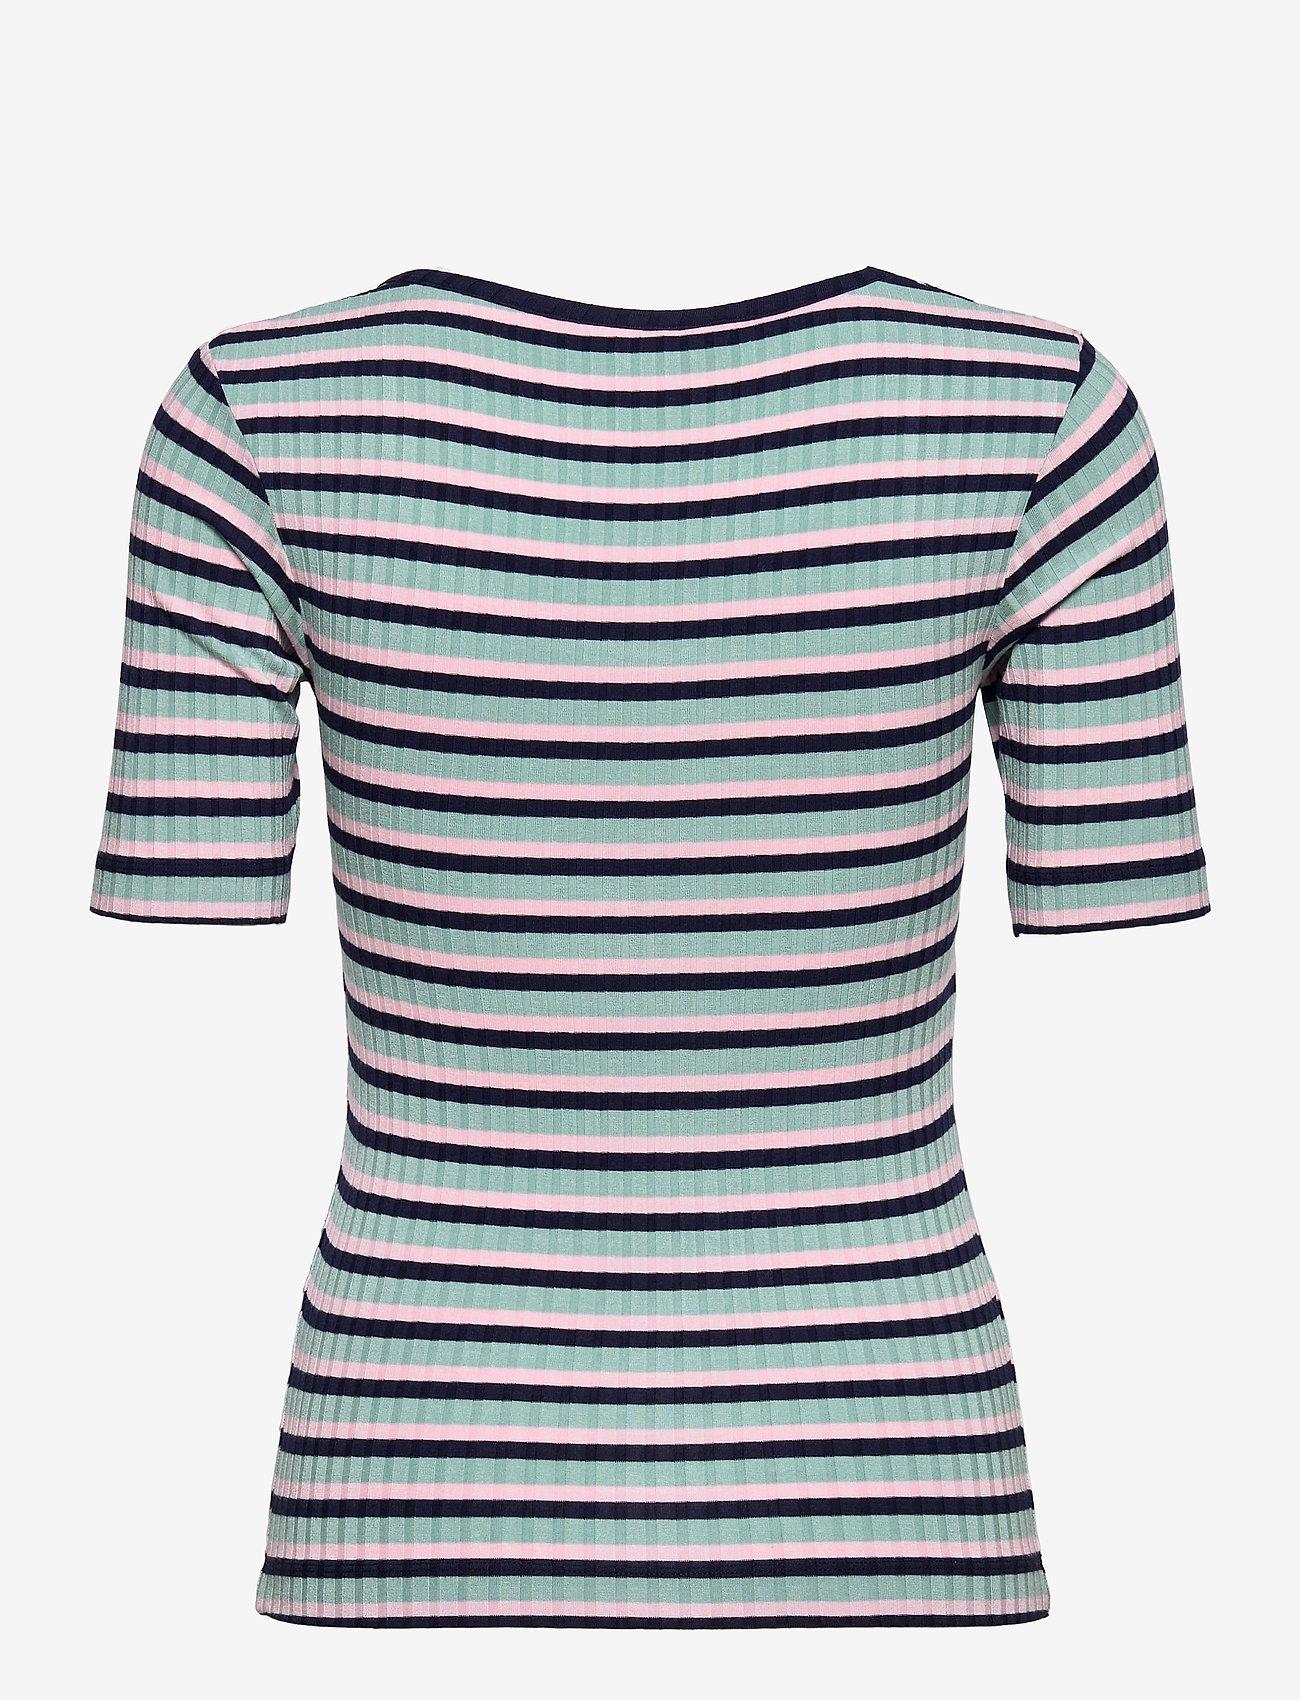 Mads Nørgaard - 5x5 Stripe Taura - t-shirts - aqua/pink/navy - 1